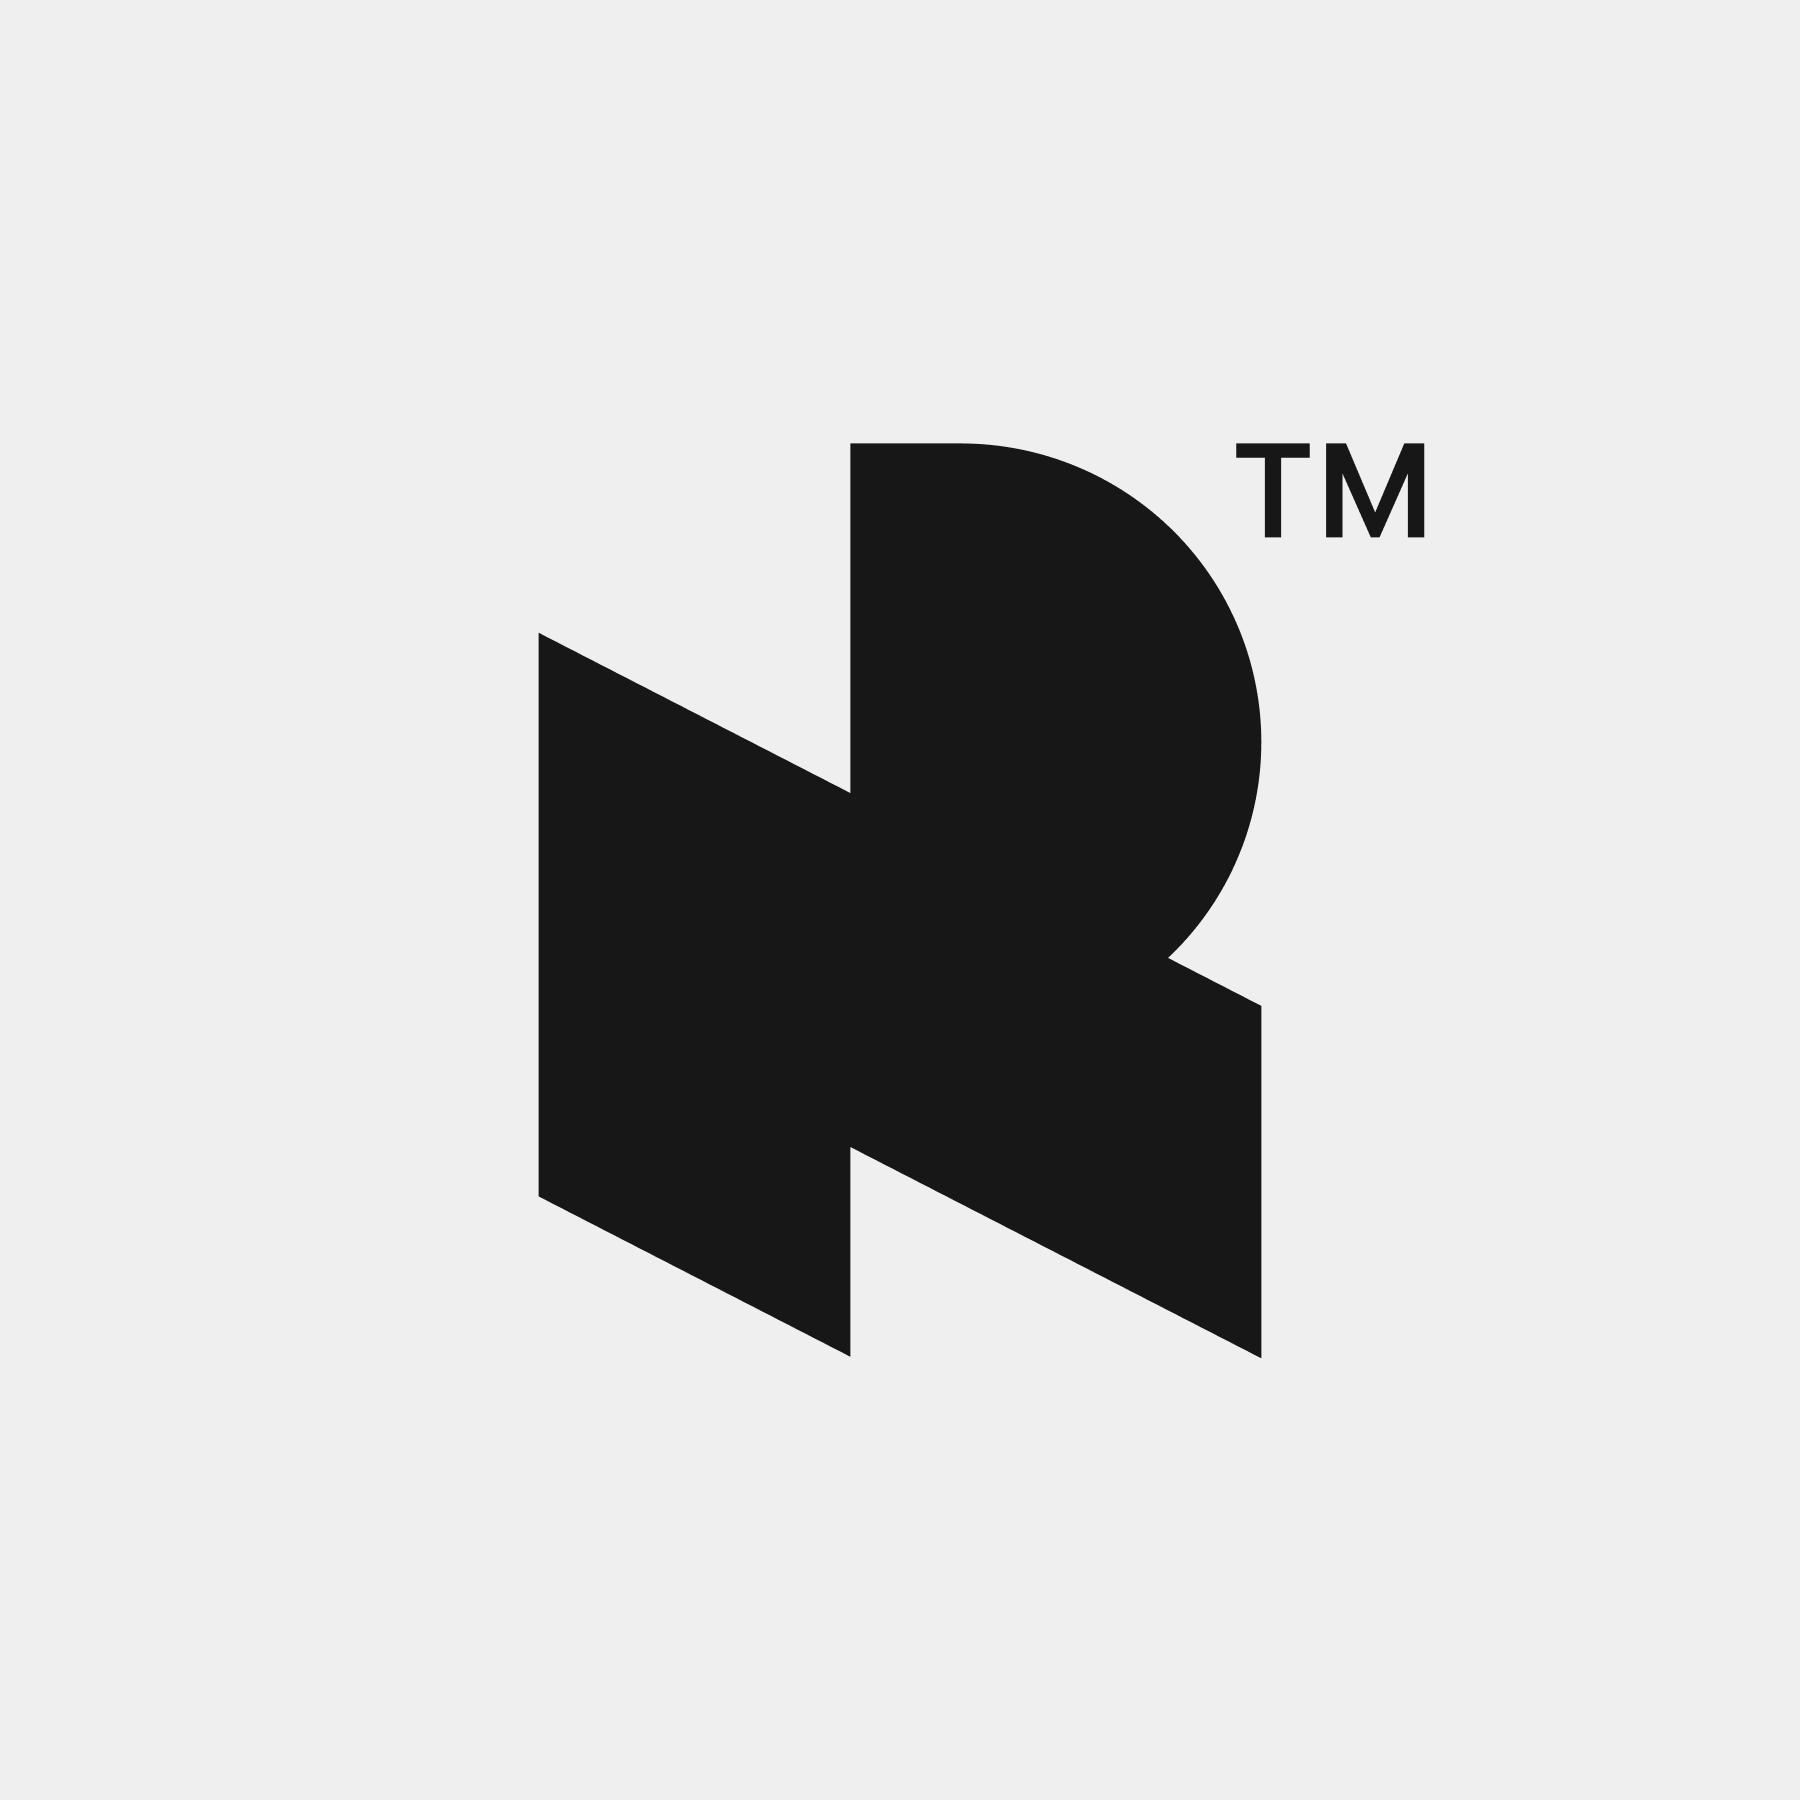 Richard Spaans on LogoLounge